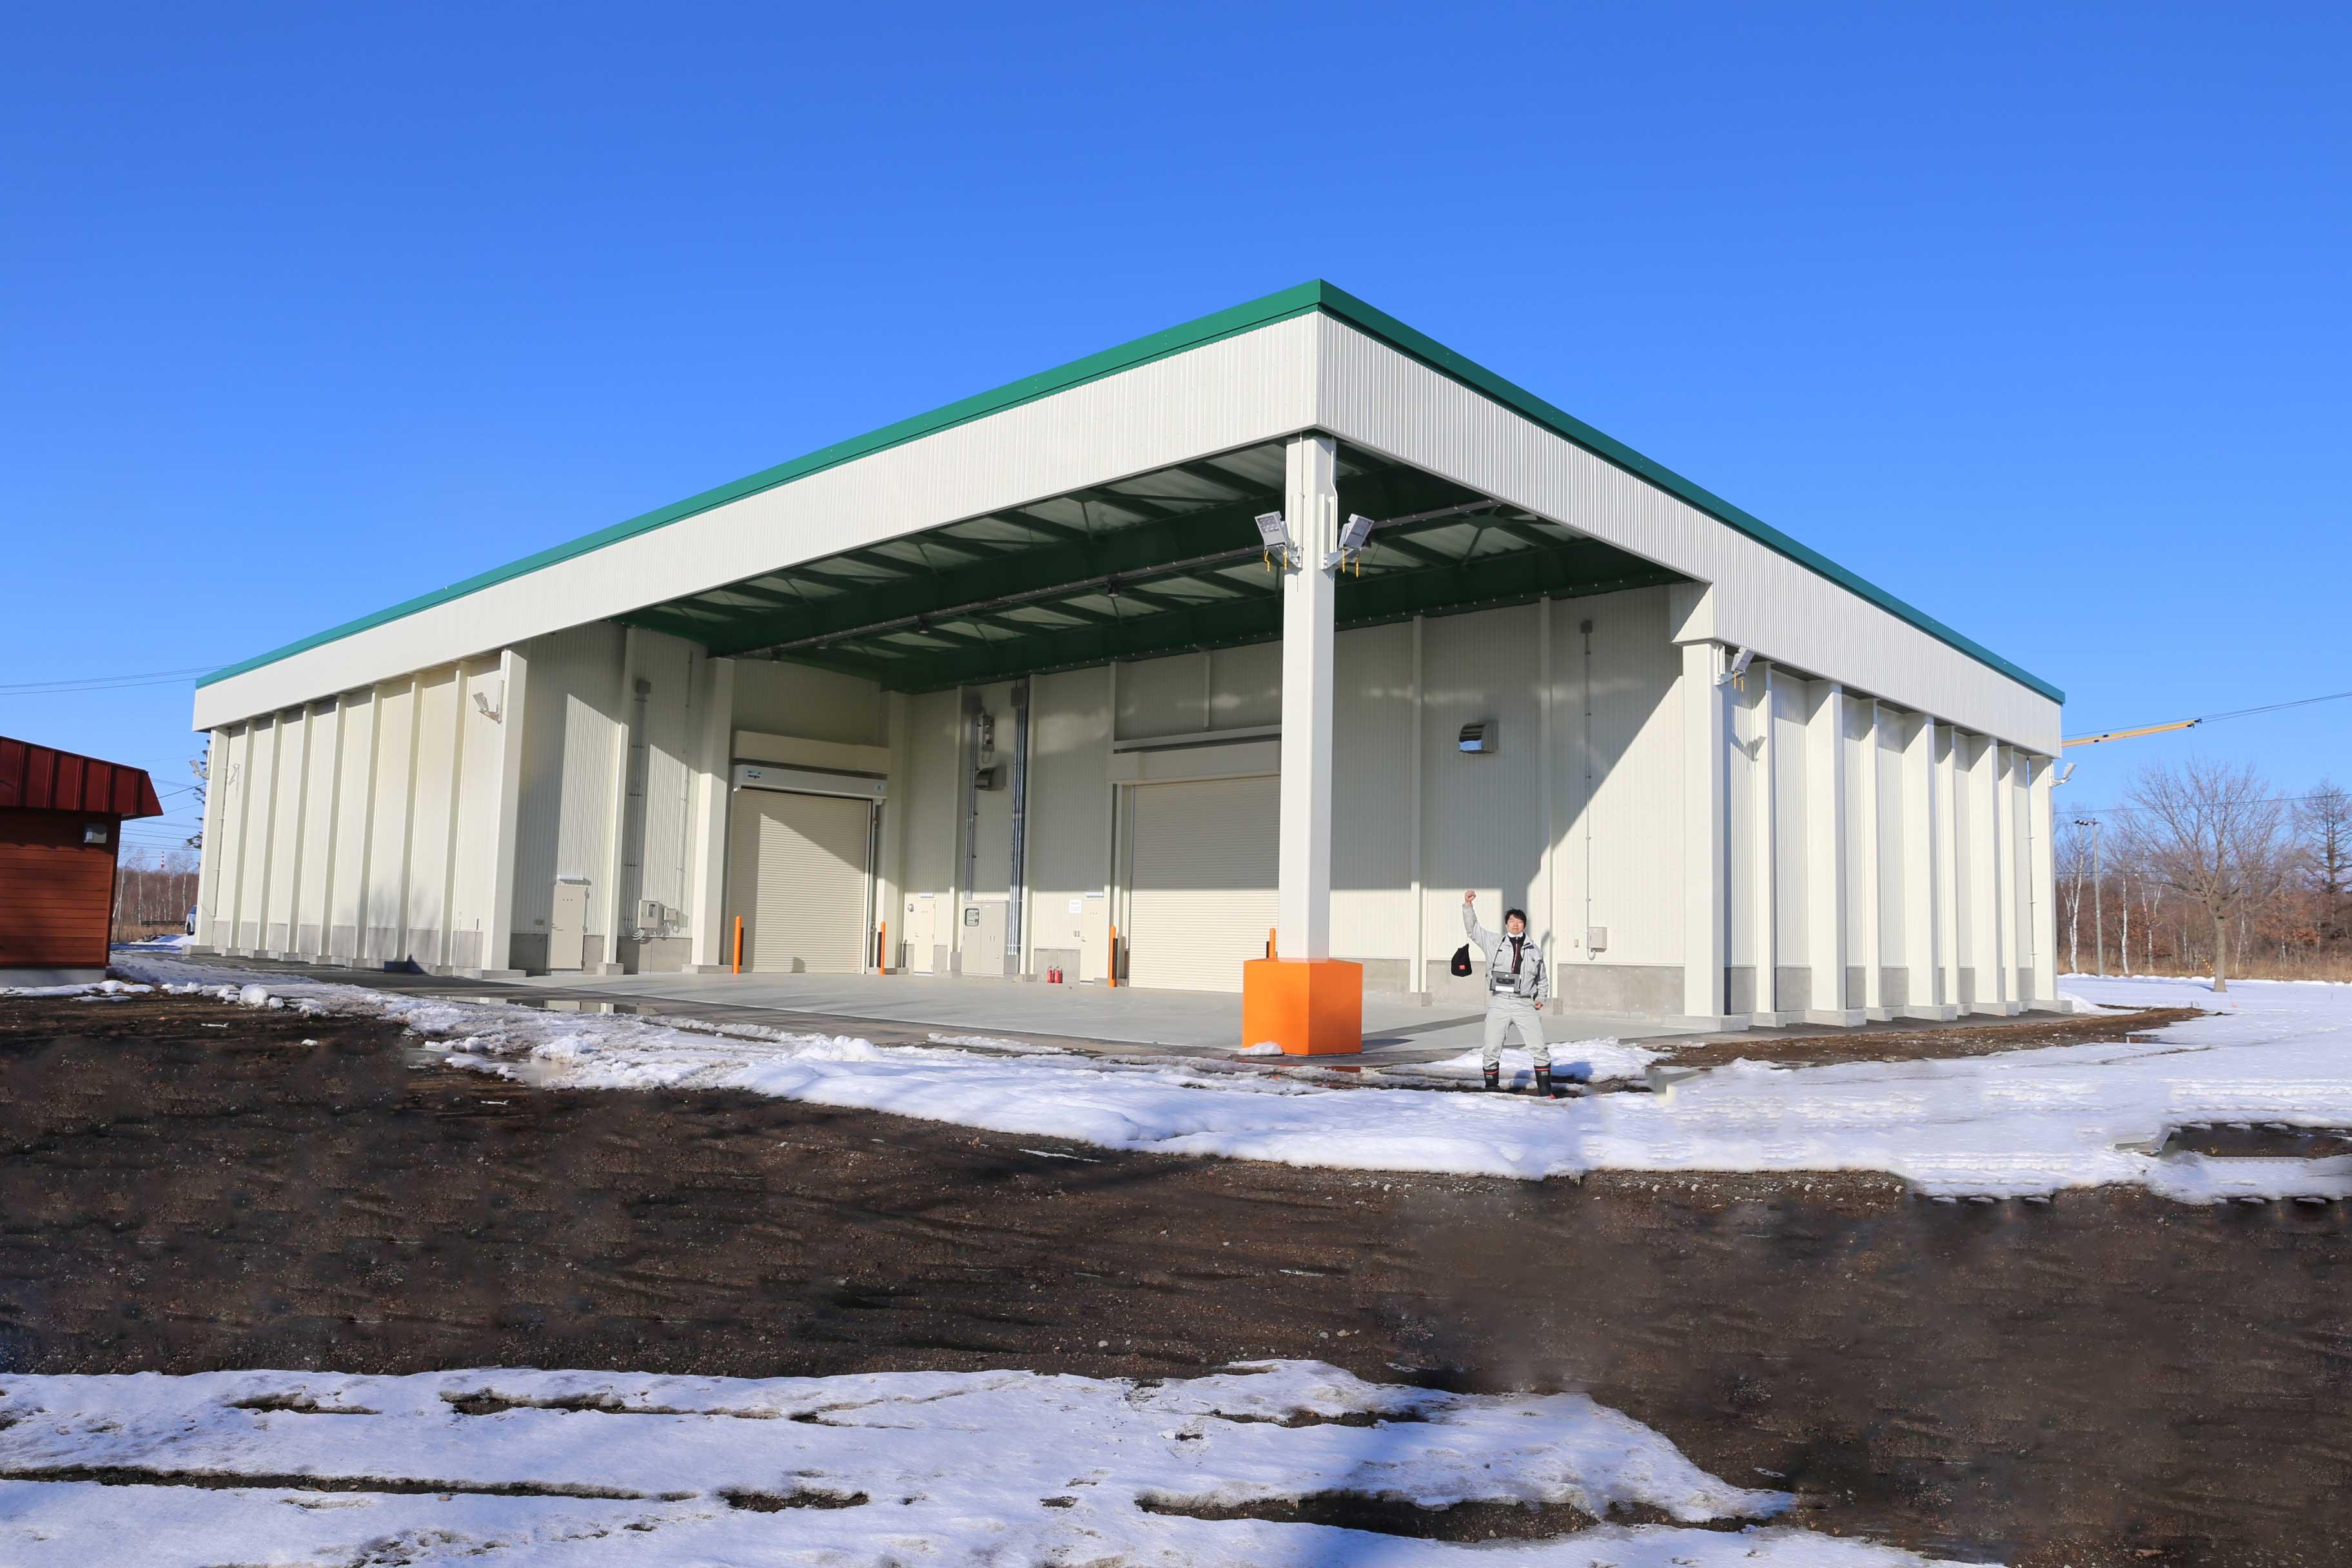 とまこまい広域農業協同組合安平地区大豆集出荷貯蔵施設新築工事